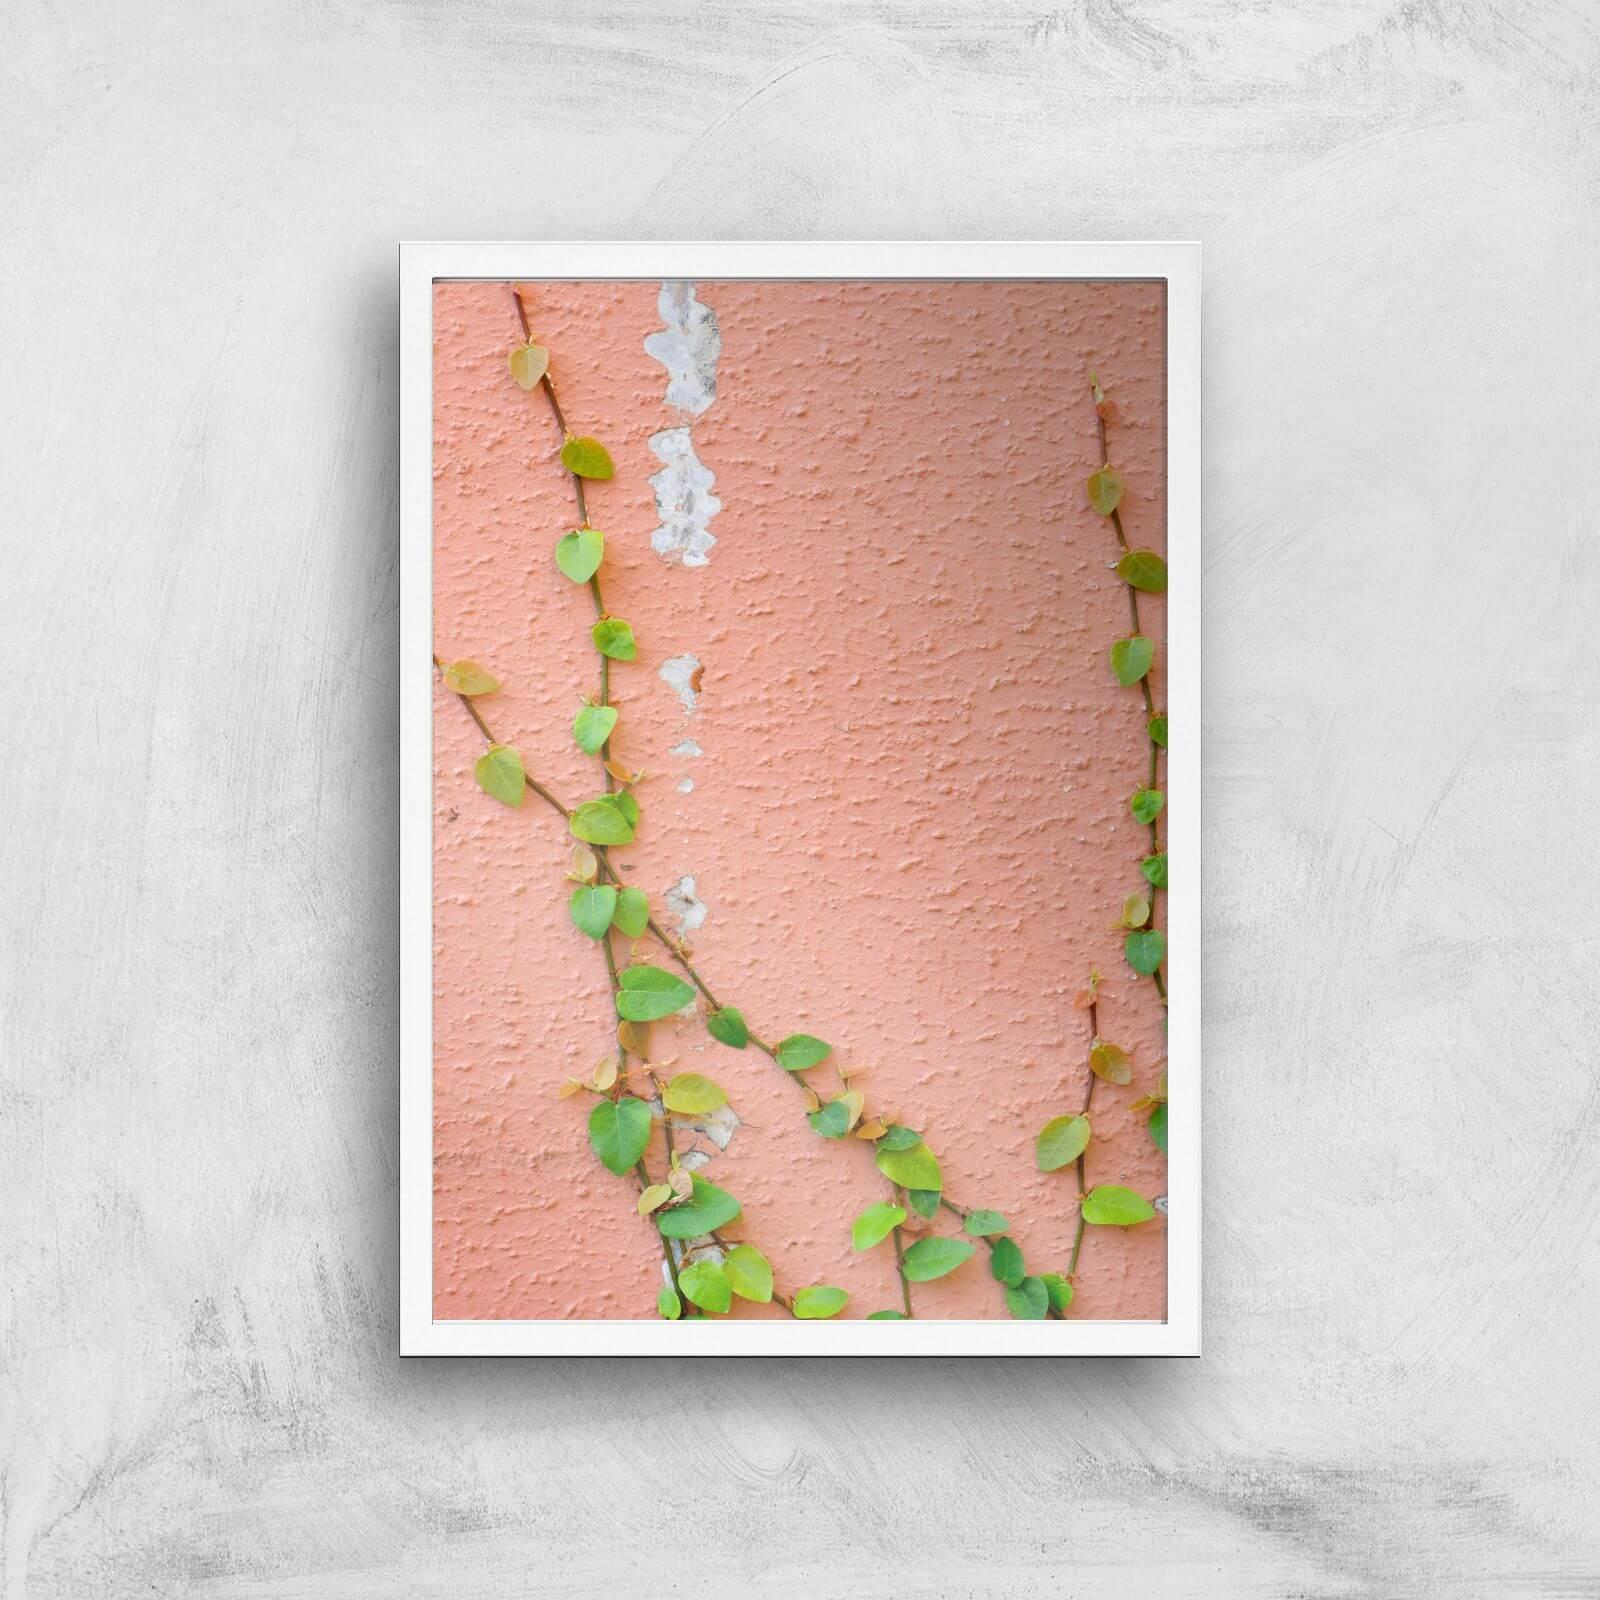 Climbing Ivy Giclee Art Print - A4 - White Frame